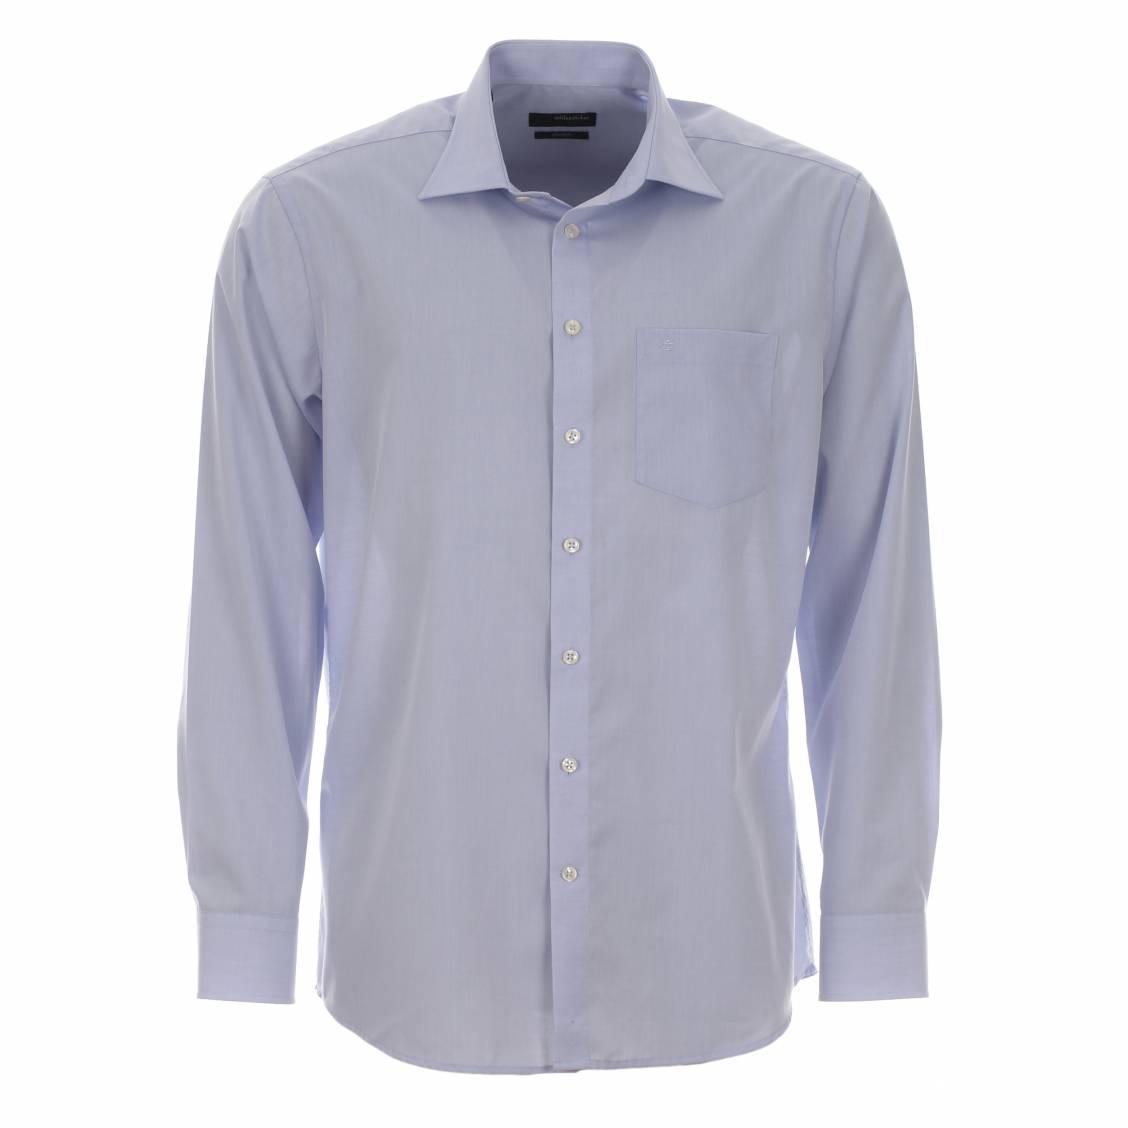 chemise droite seidensticker spendesto sans repassage bleu ciel rue des hommes. Black Bedroom Furniture Sets. Home Design Ideas